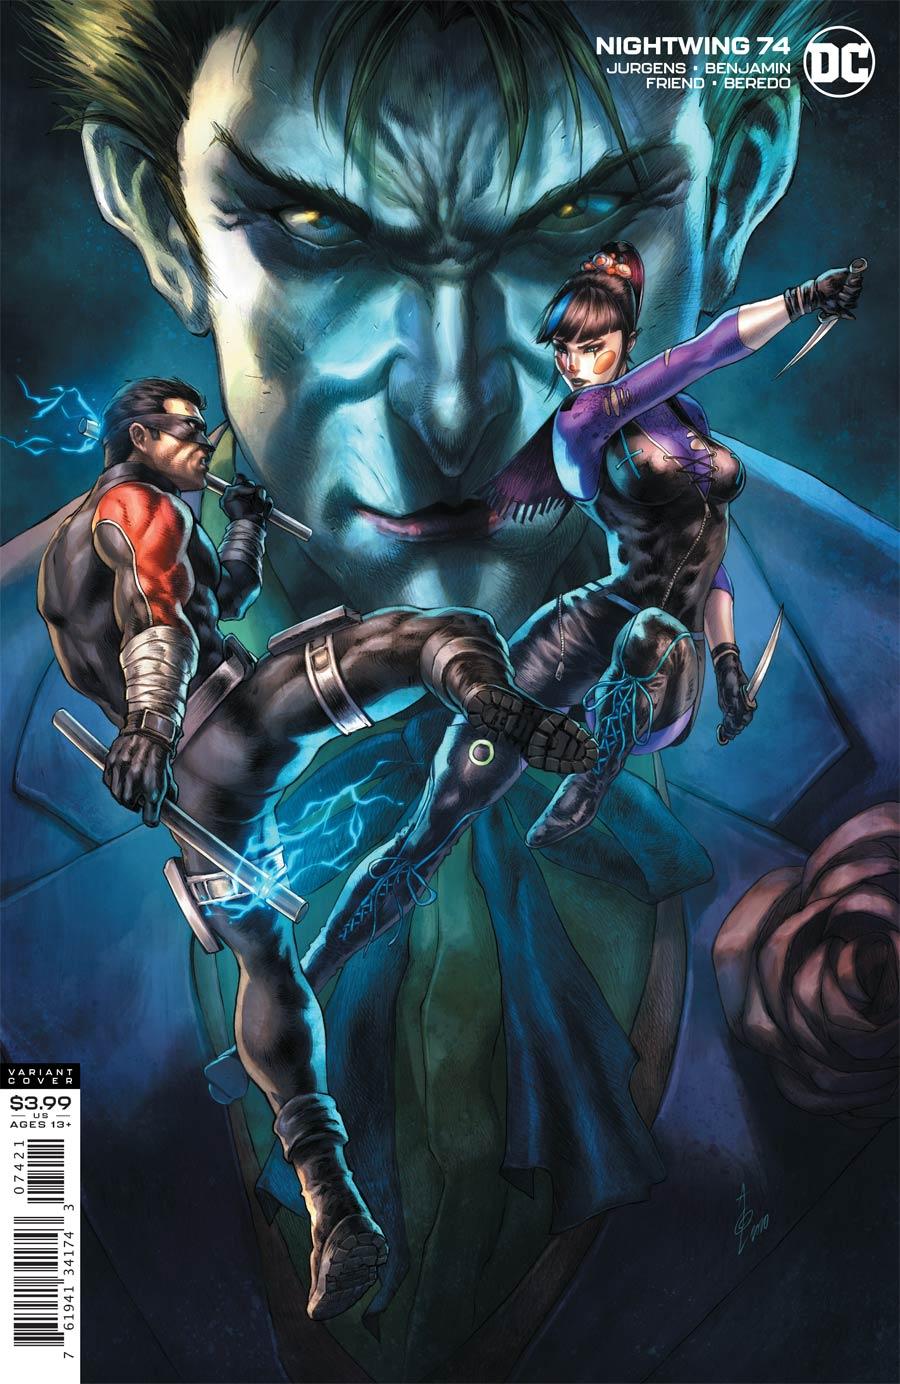 Nightwing Vol 4 #74 Cover B Variant Alan Quah Cover (Joker War Tie-In)